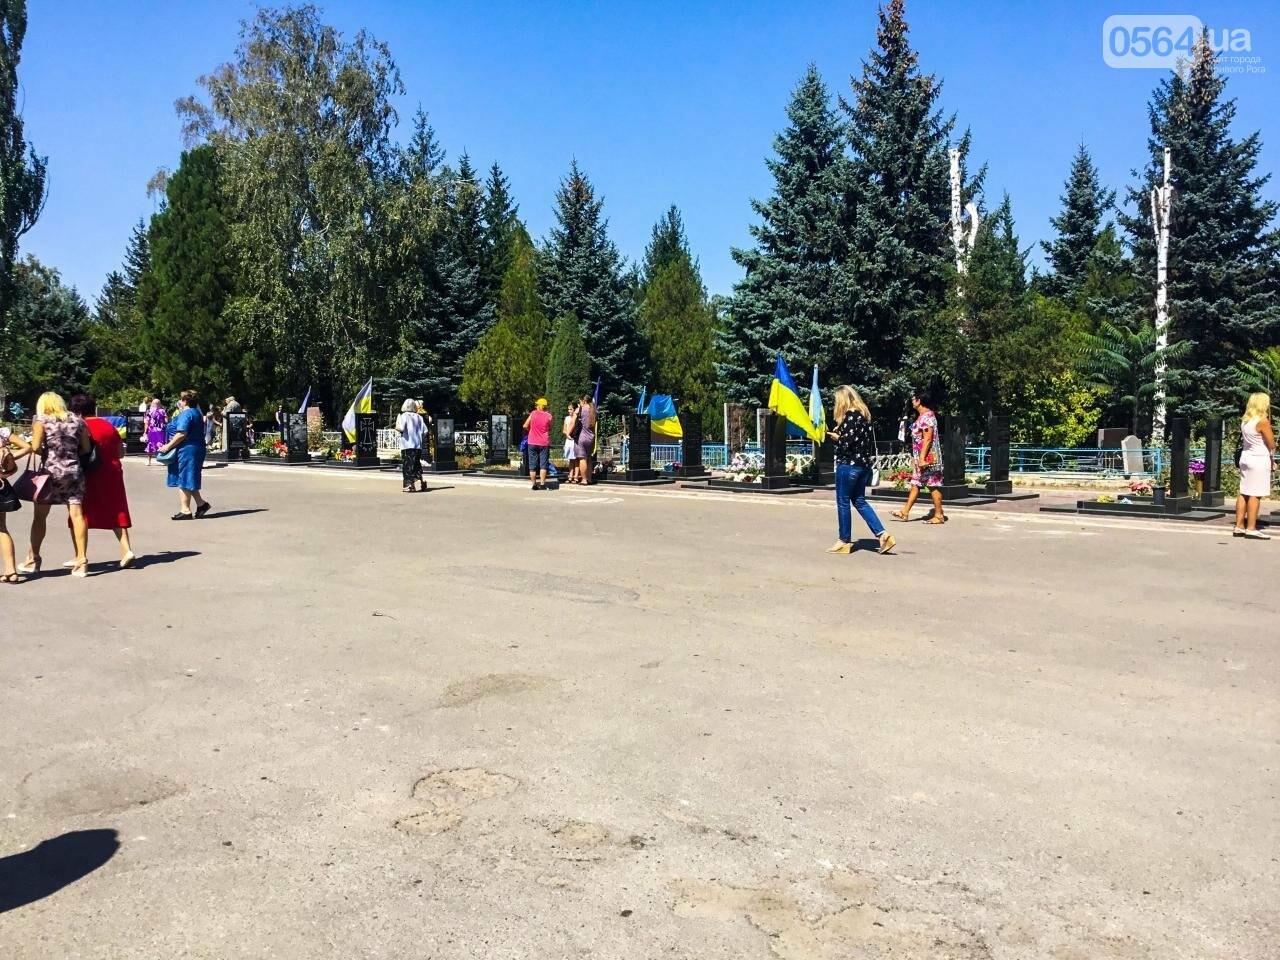 На Аллее Героев провели панихиду по погибшим в зоне АТО криворожанам, - ФОТО , фото-1